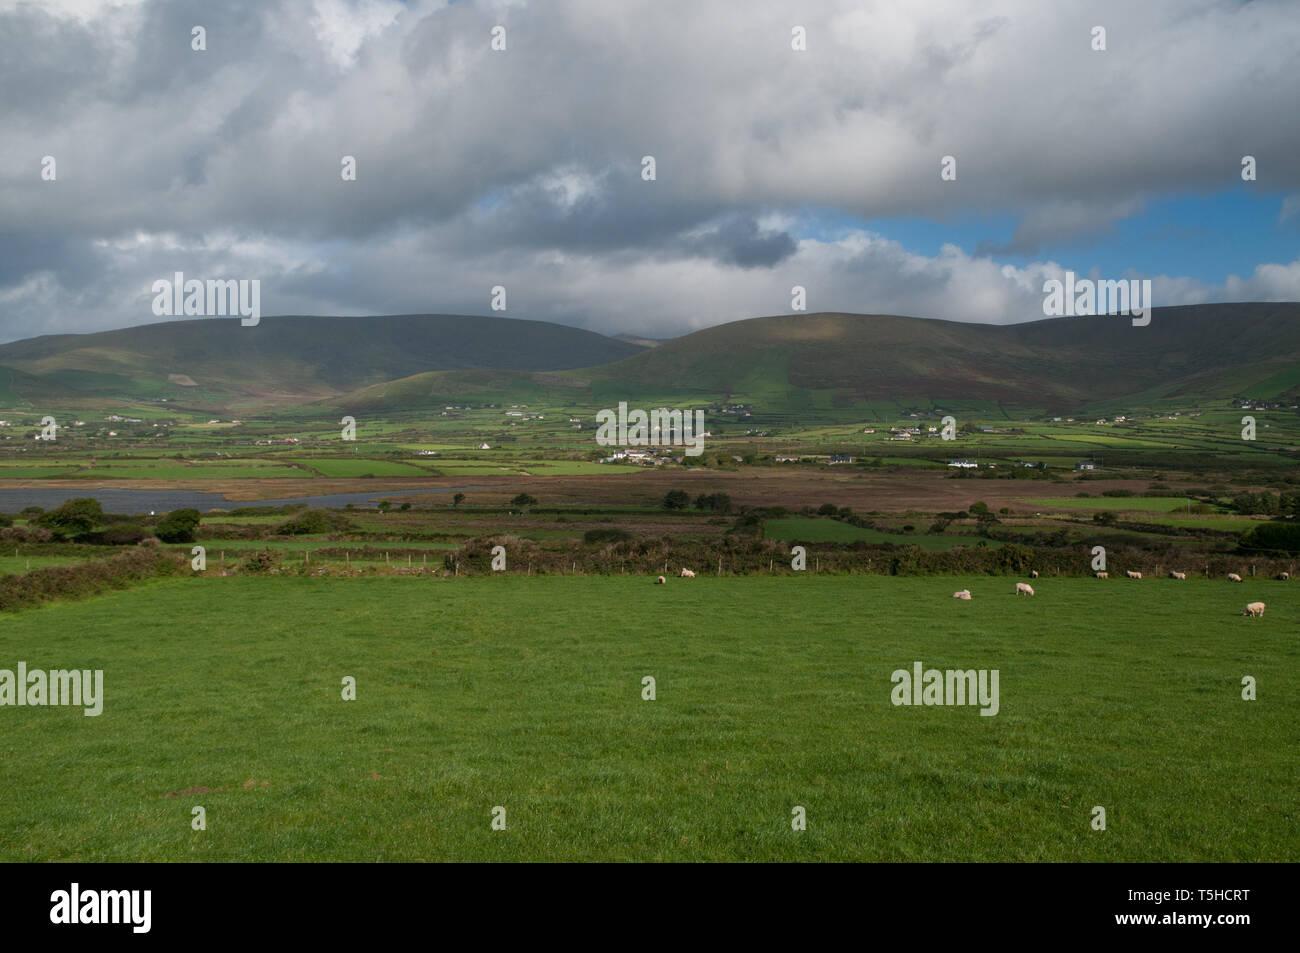 Schafe, die in der Dingle-Halbinsel, Grafschaft Kerry, Irland weiden lassen. / Sheep grazing near Dingle, Co. Kerry, Ireland. - Stock Image